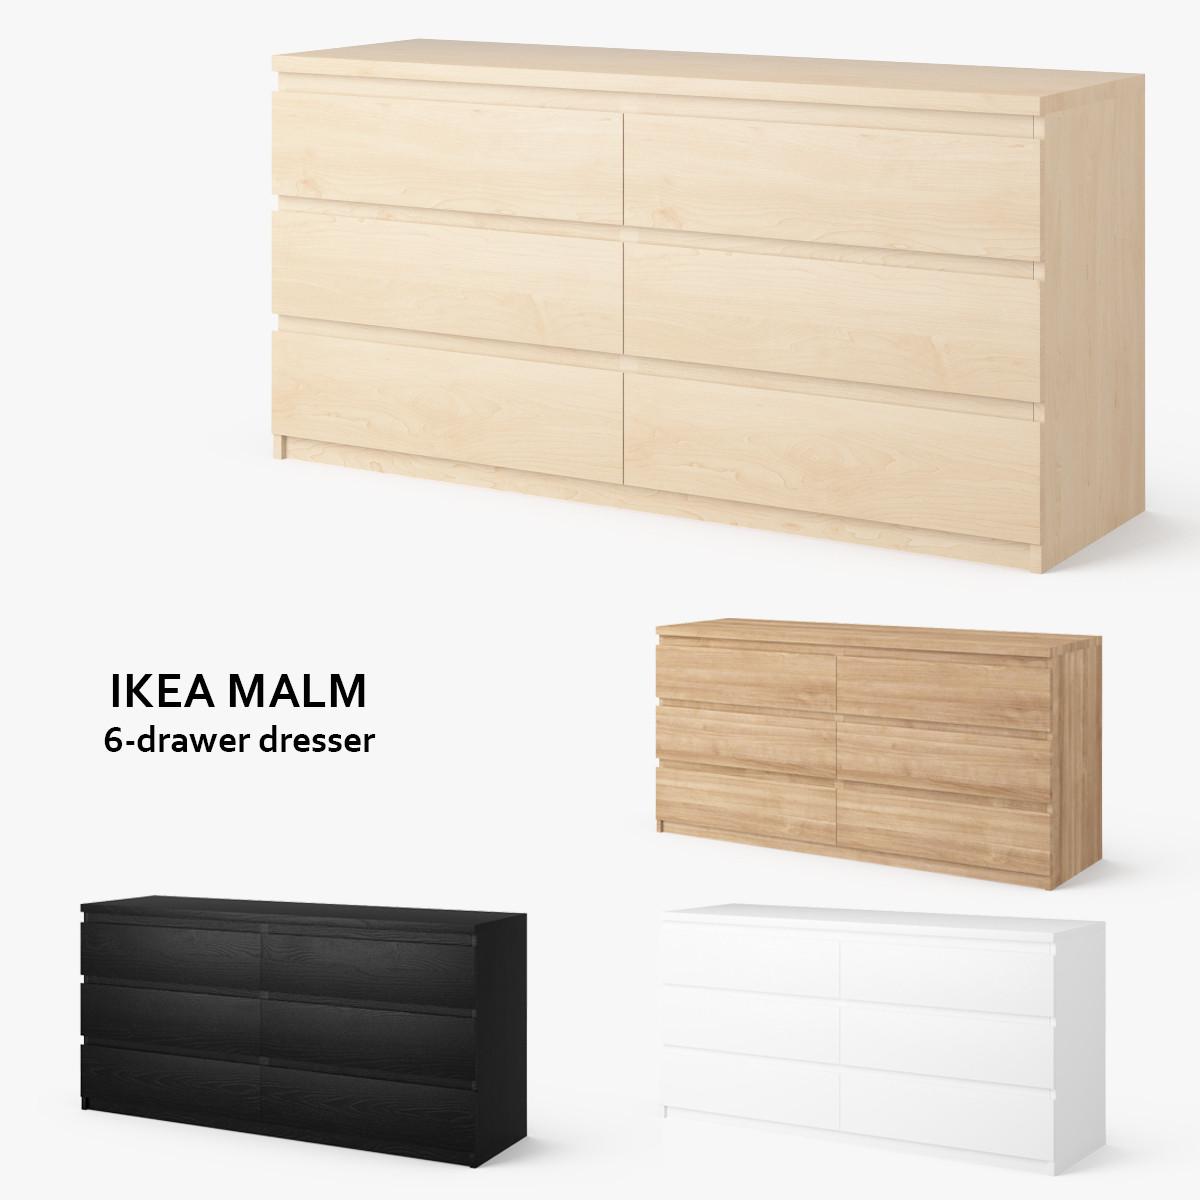 Ikea_Malm_6-Drawer_Dresser_01.jpg